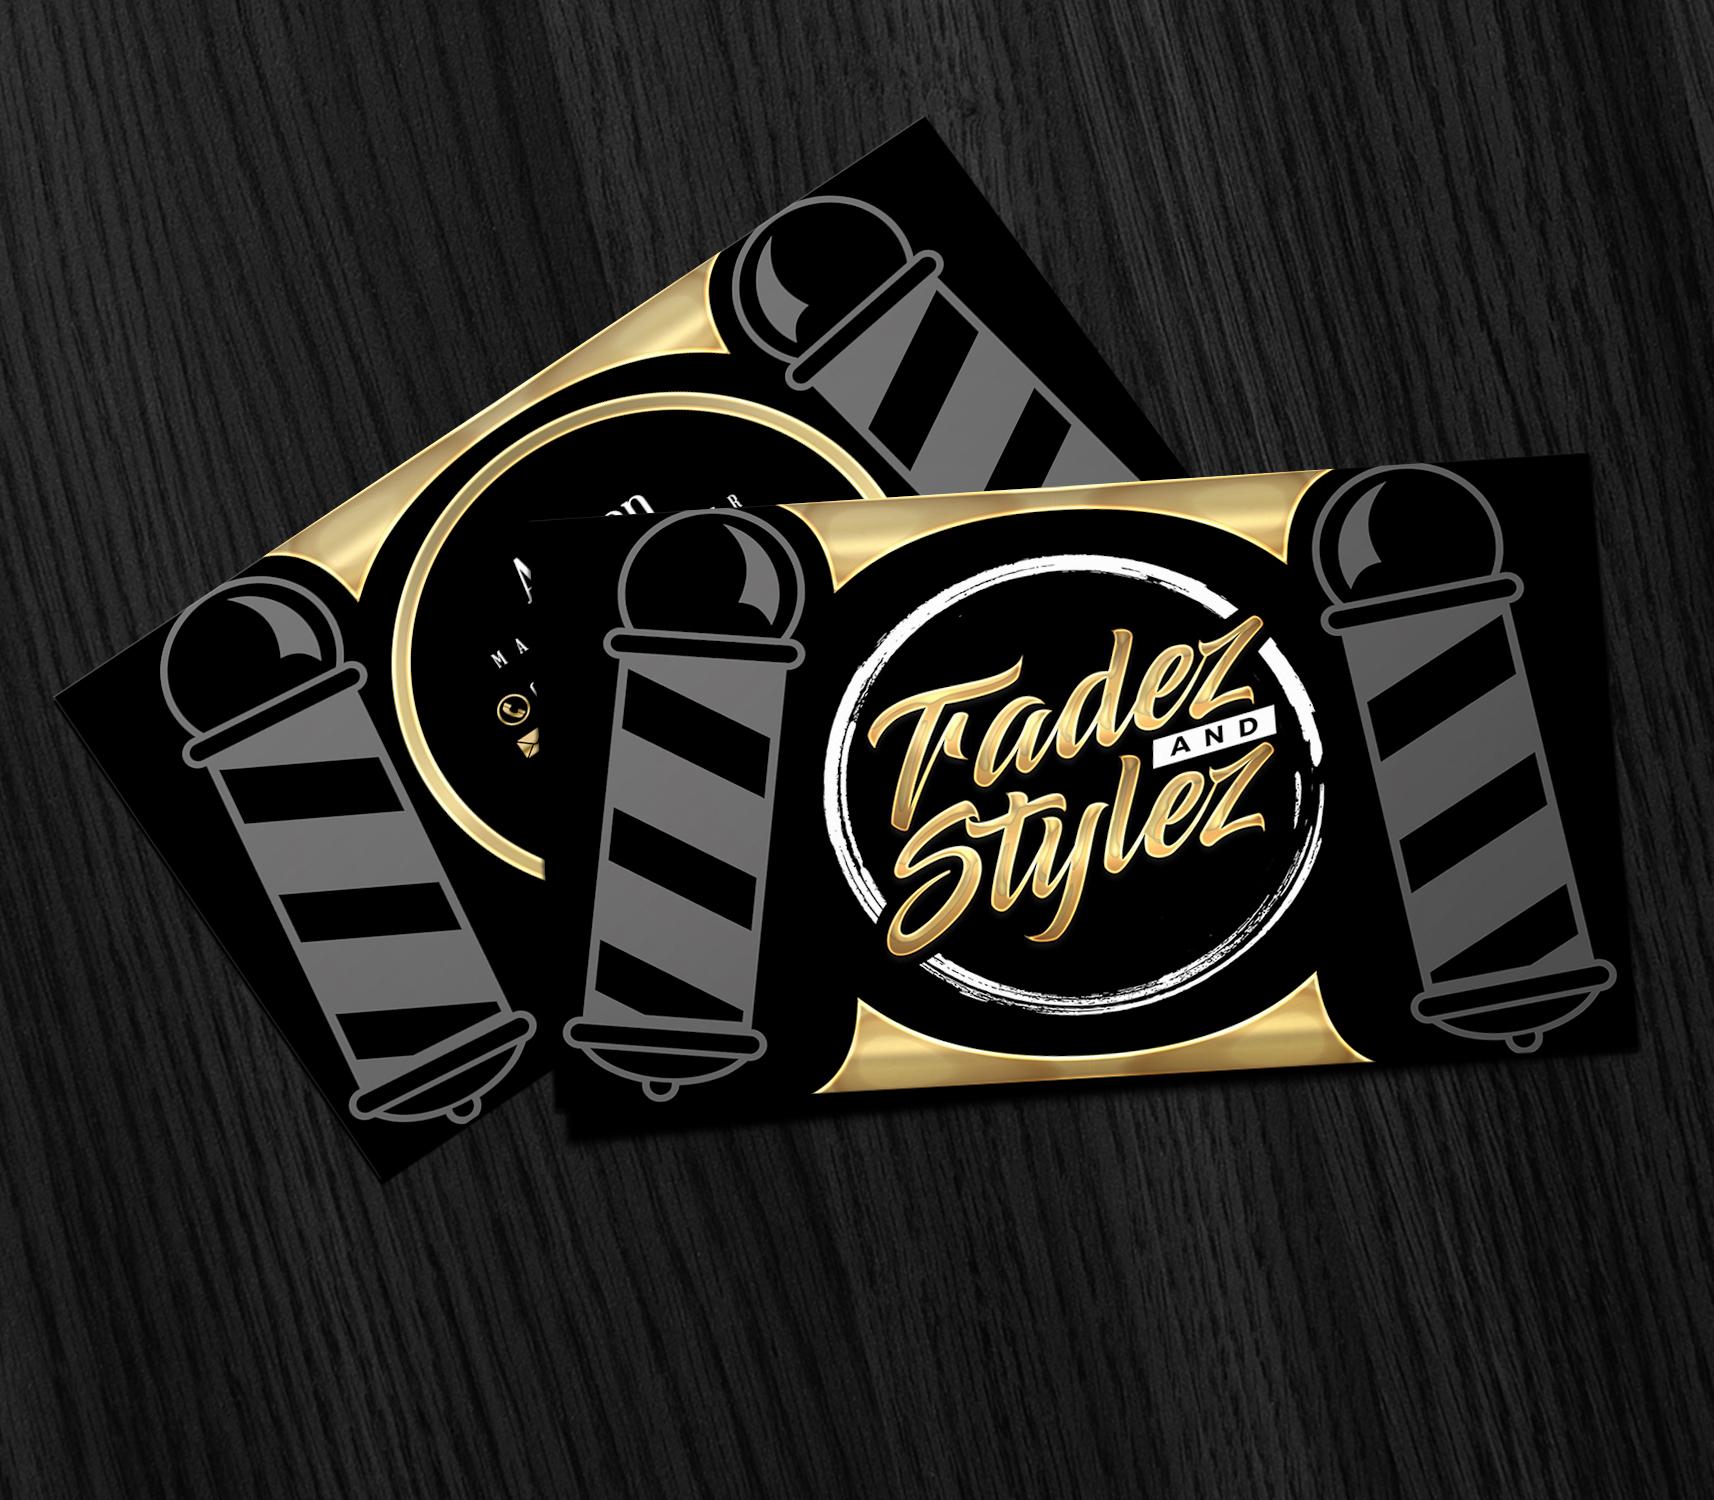 Tradez and stylez business cards mockup